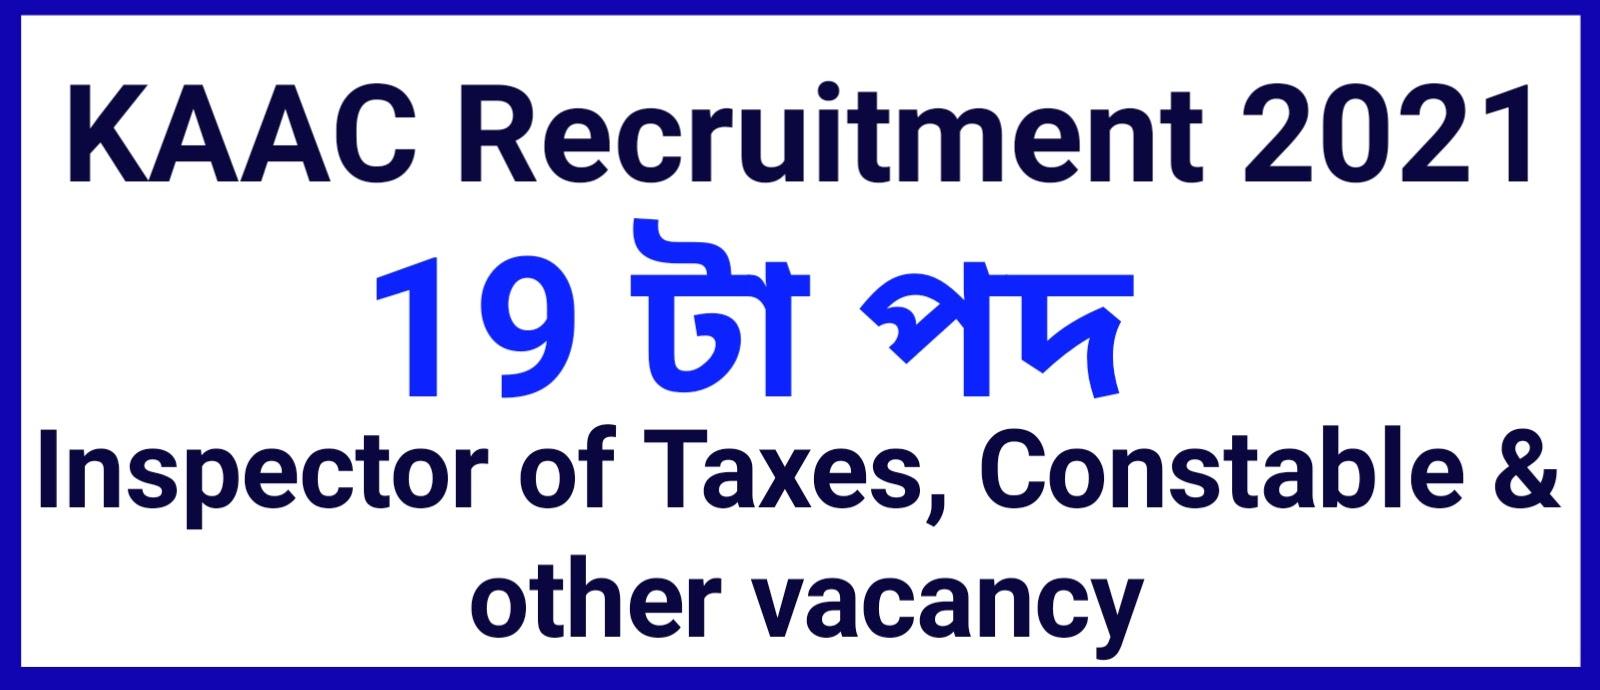 KAAC Recruitment 2021 –Inspector Of Taxes, Constable & Other Vacancy